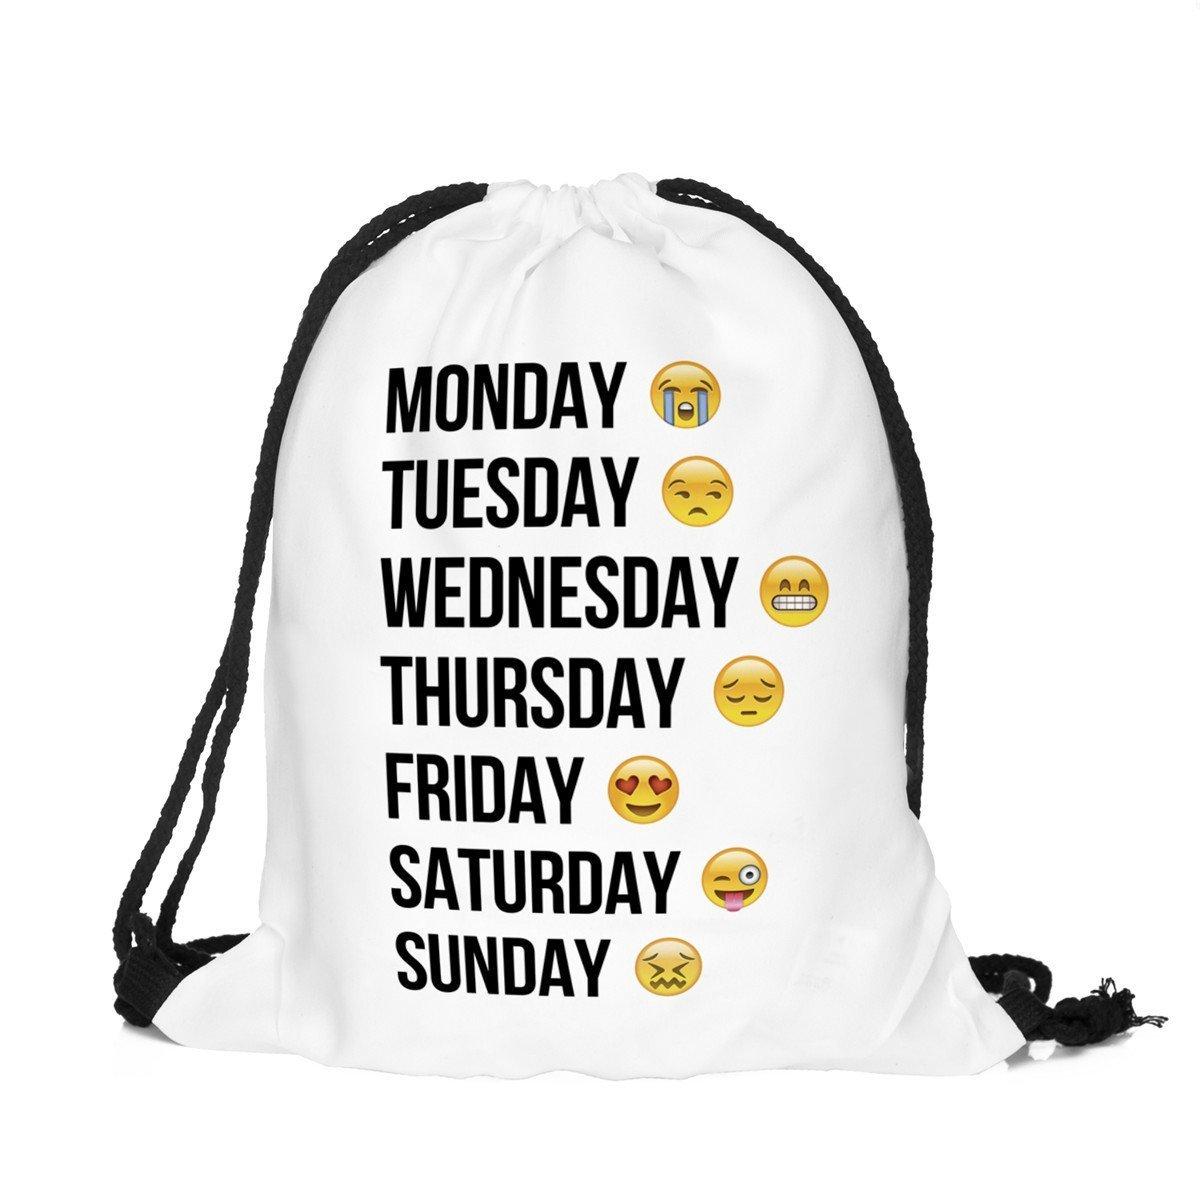 Aigemi Unicorn Print Drawstring Gym Sport Bag, Large Lightweight Gym Sackpack Backpack School Rucksack (Week-white)